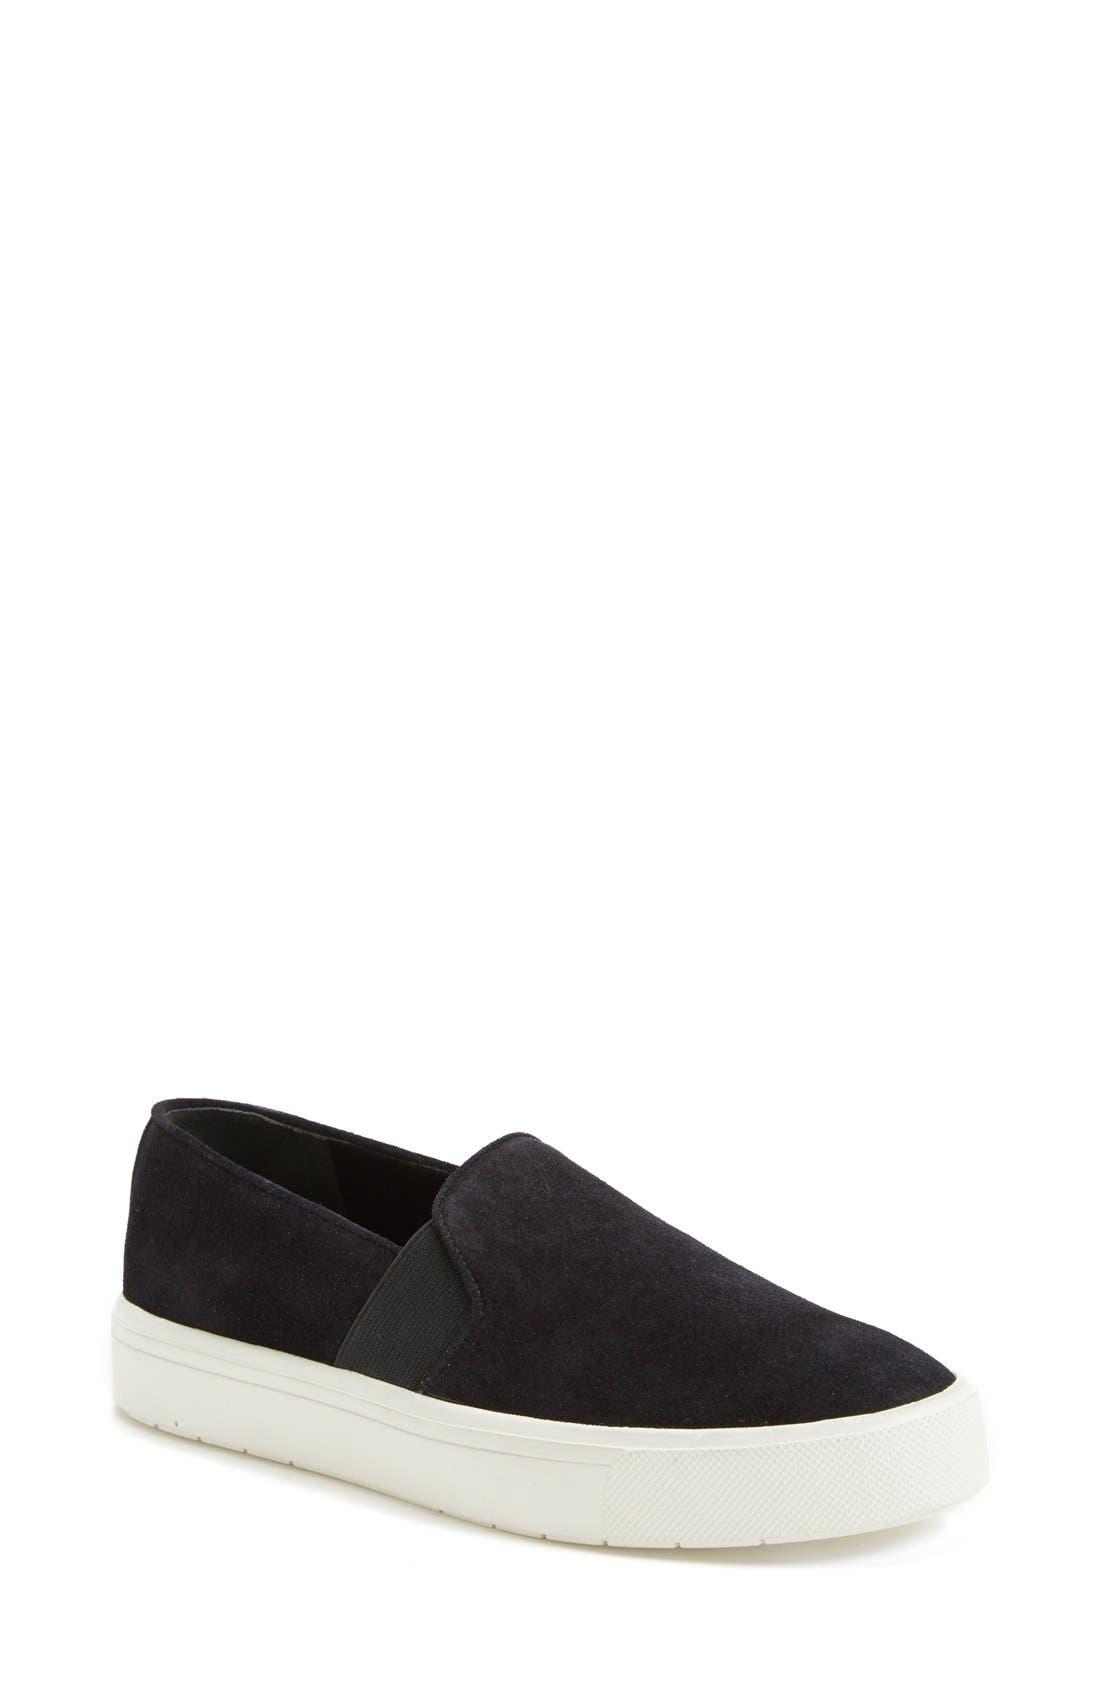 ,                             'Berlin 6' Slip-On Suede Sneaker,                             Main thumbnail 1, color,                             001